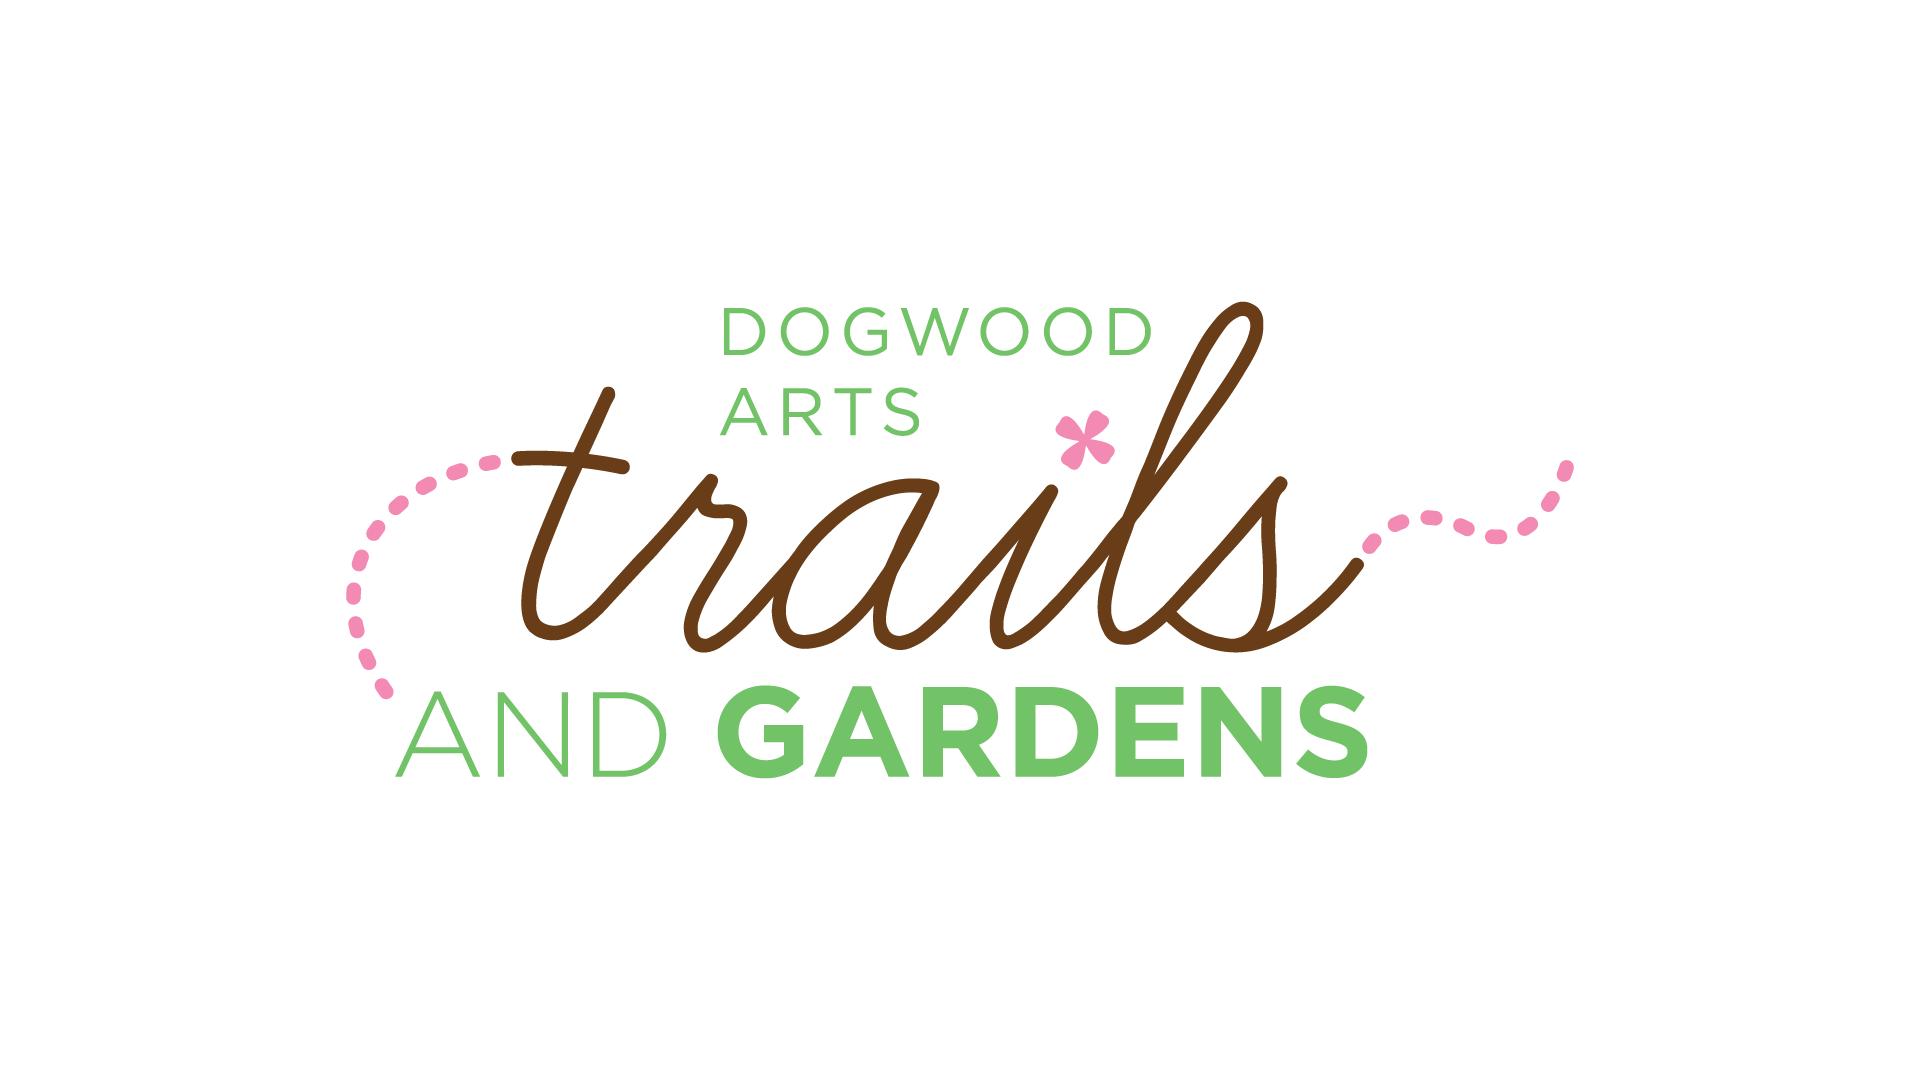 Dogwood Arts Trails and Gardens logo